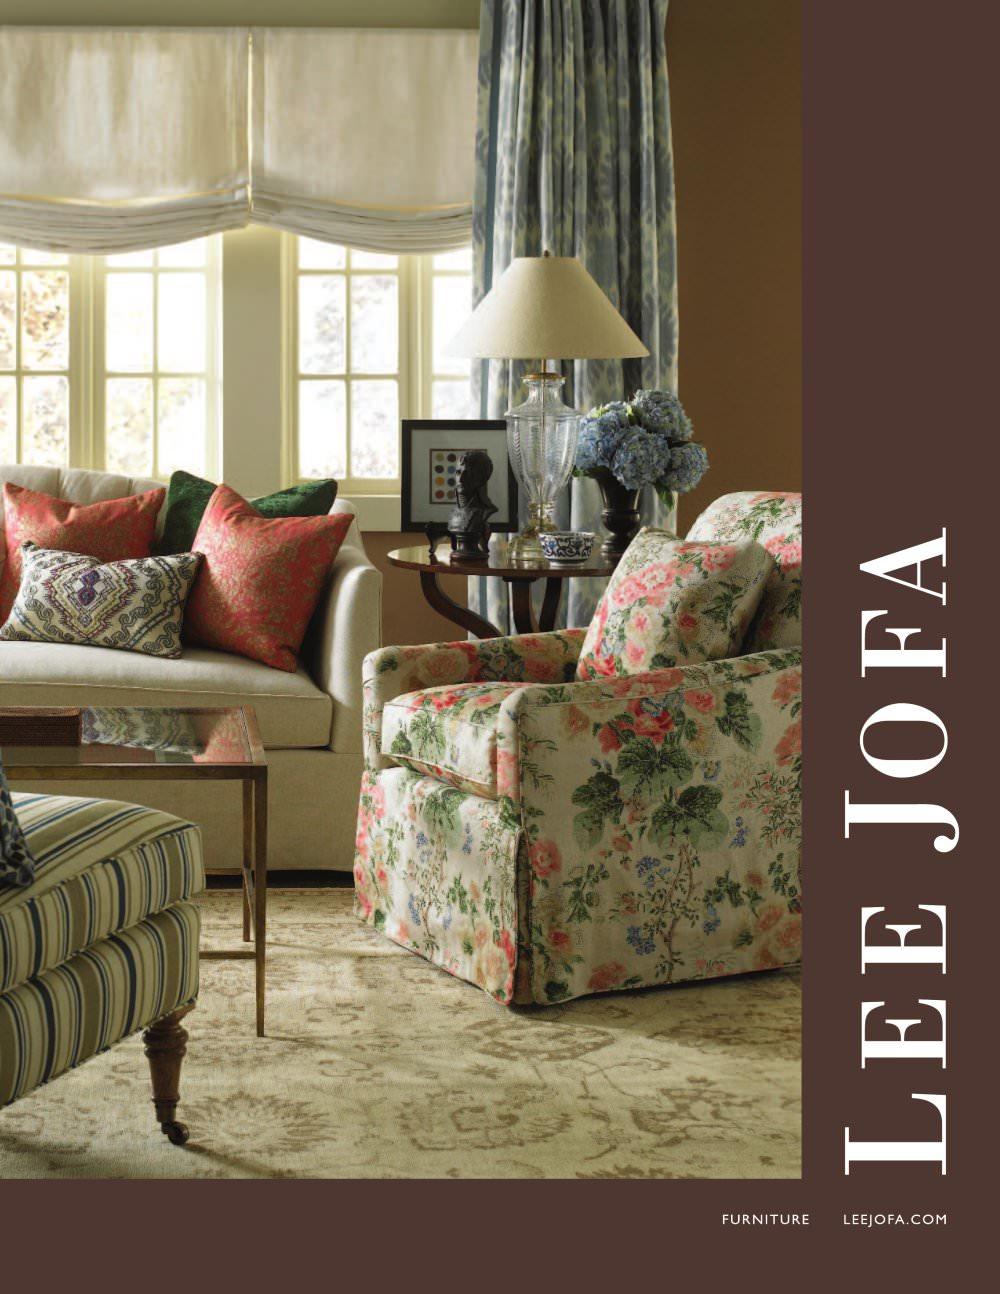 furniture catalogs 2014. Lee Jofa Furniture 2016 Ues Catalogs 2014 2